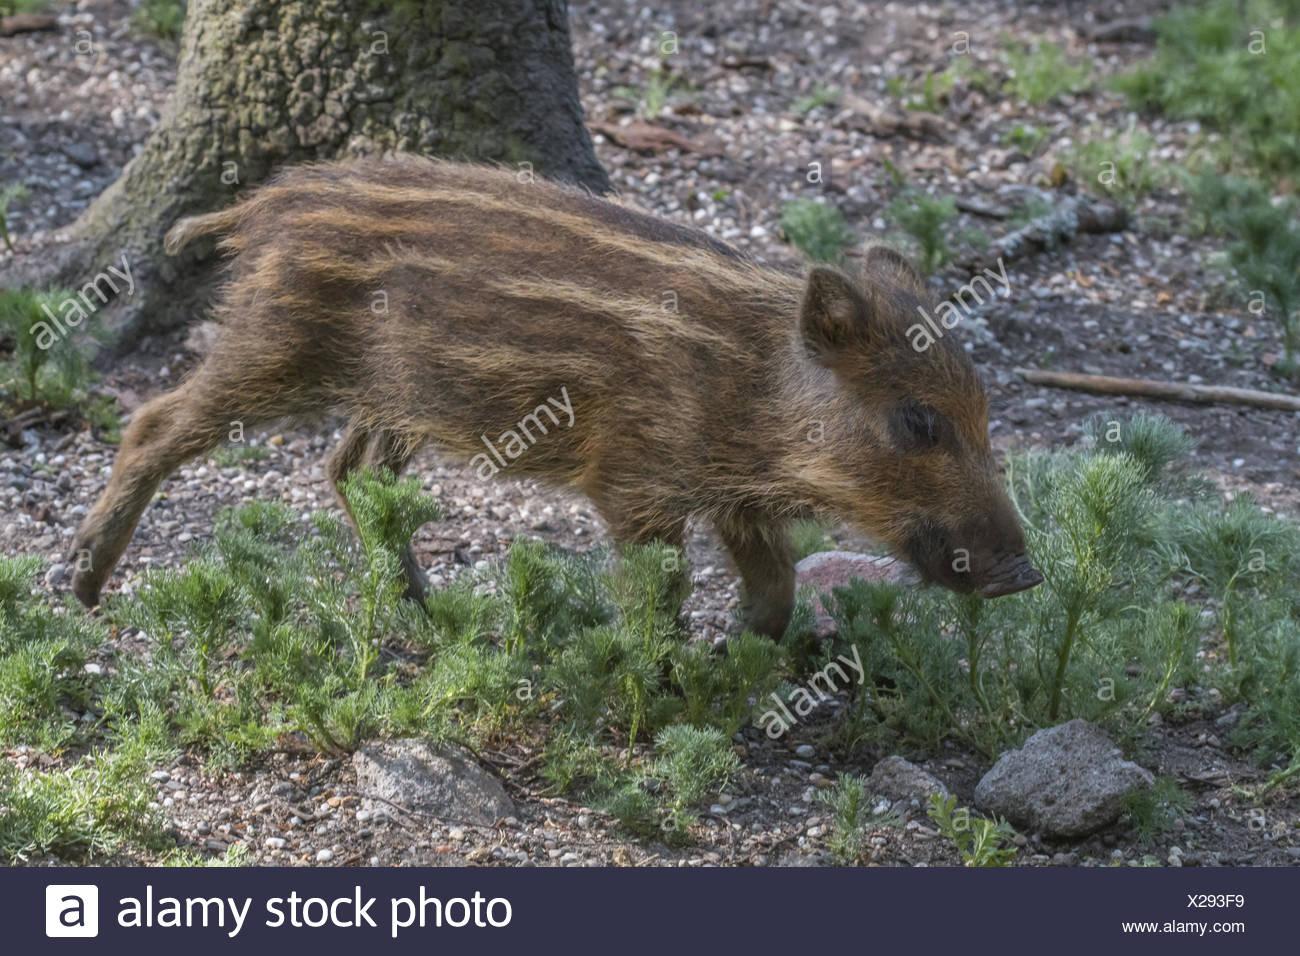 Wild boar (Sus scrofa) - Stock Image